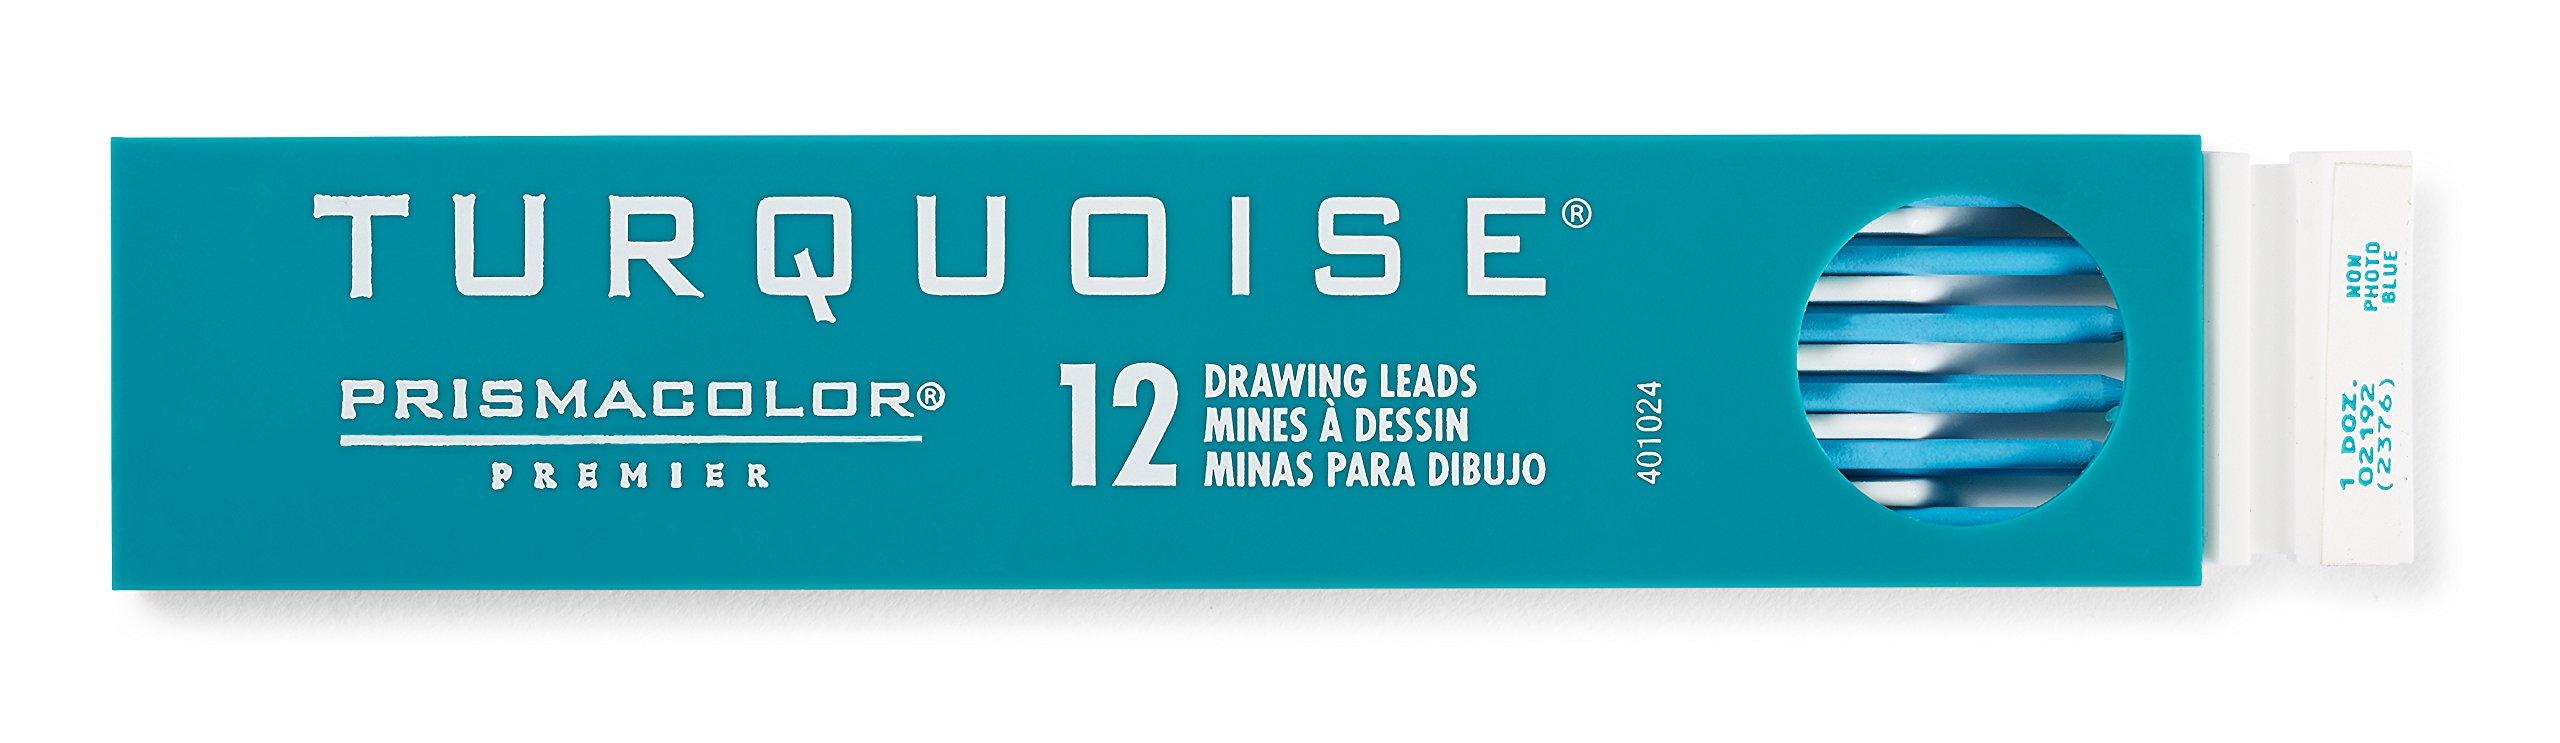 Prismacolor Premier Turquoise Graphite Drawing Leads, Non-Photo Blue, 2mm, 12-Count